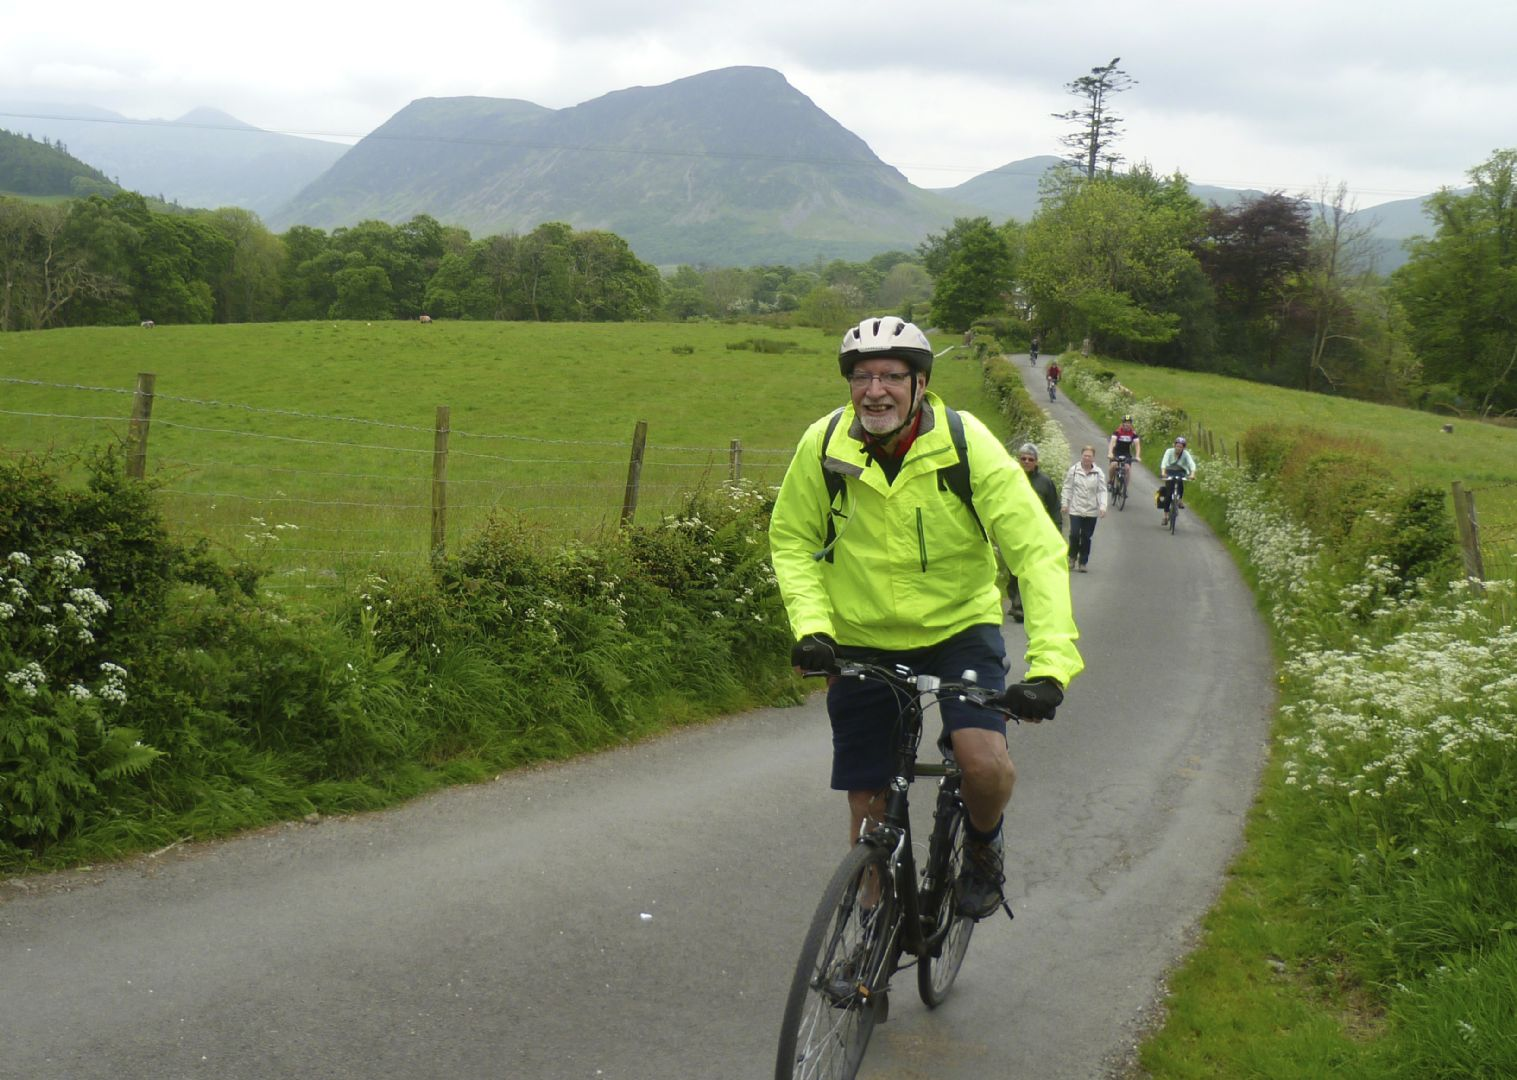 P1020379.jpg - UK - C2C - Coast to Coast 5 Days Cycling - Self-Guided Leisure Cycling Holiday - Leisure Cycling